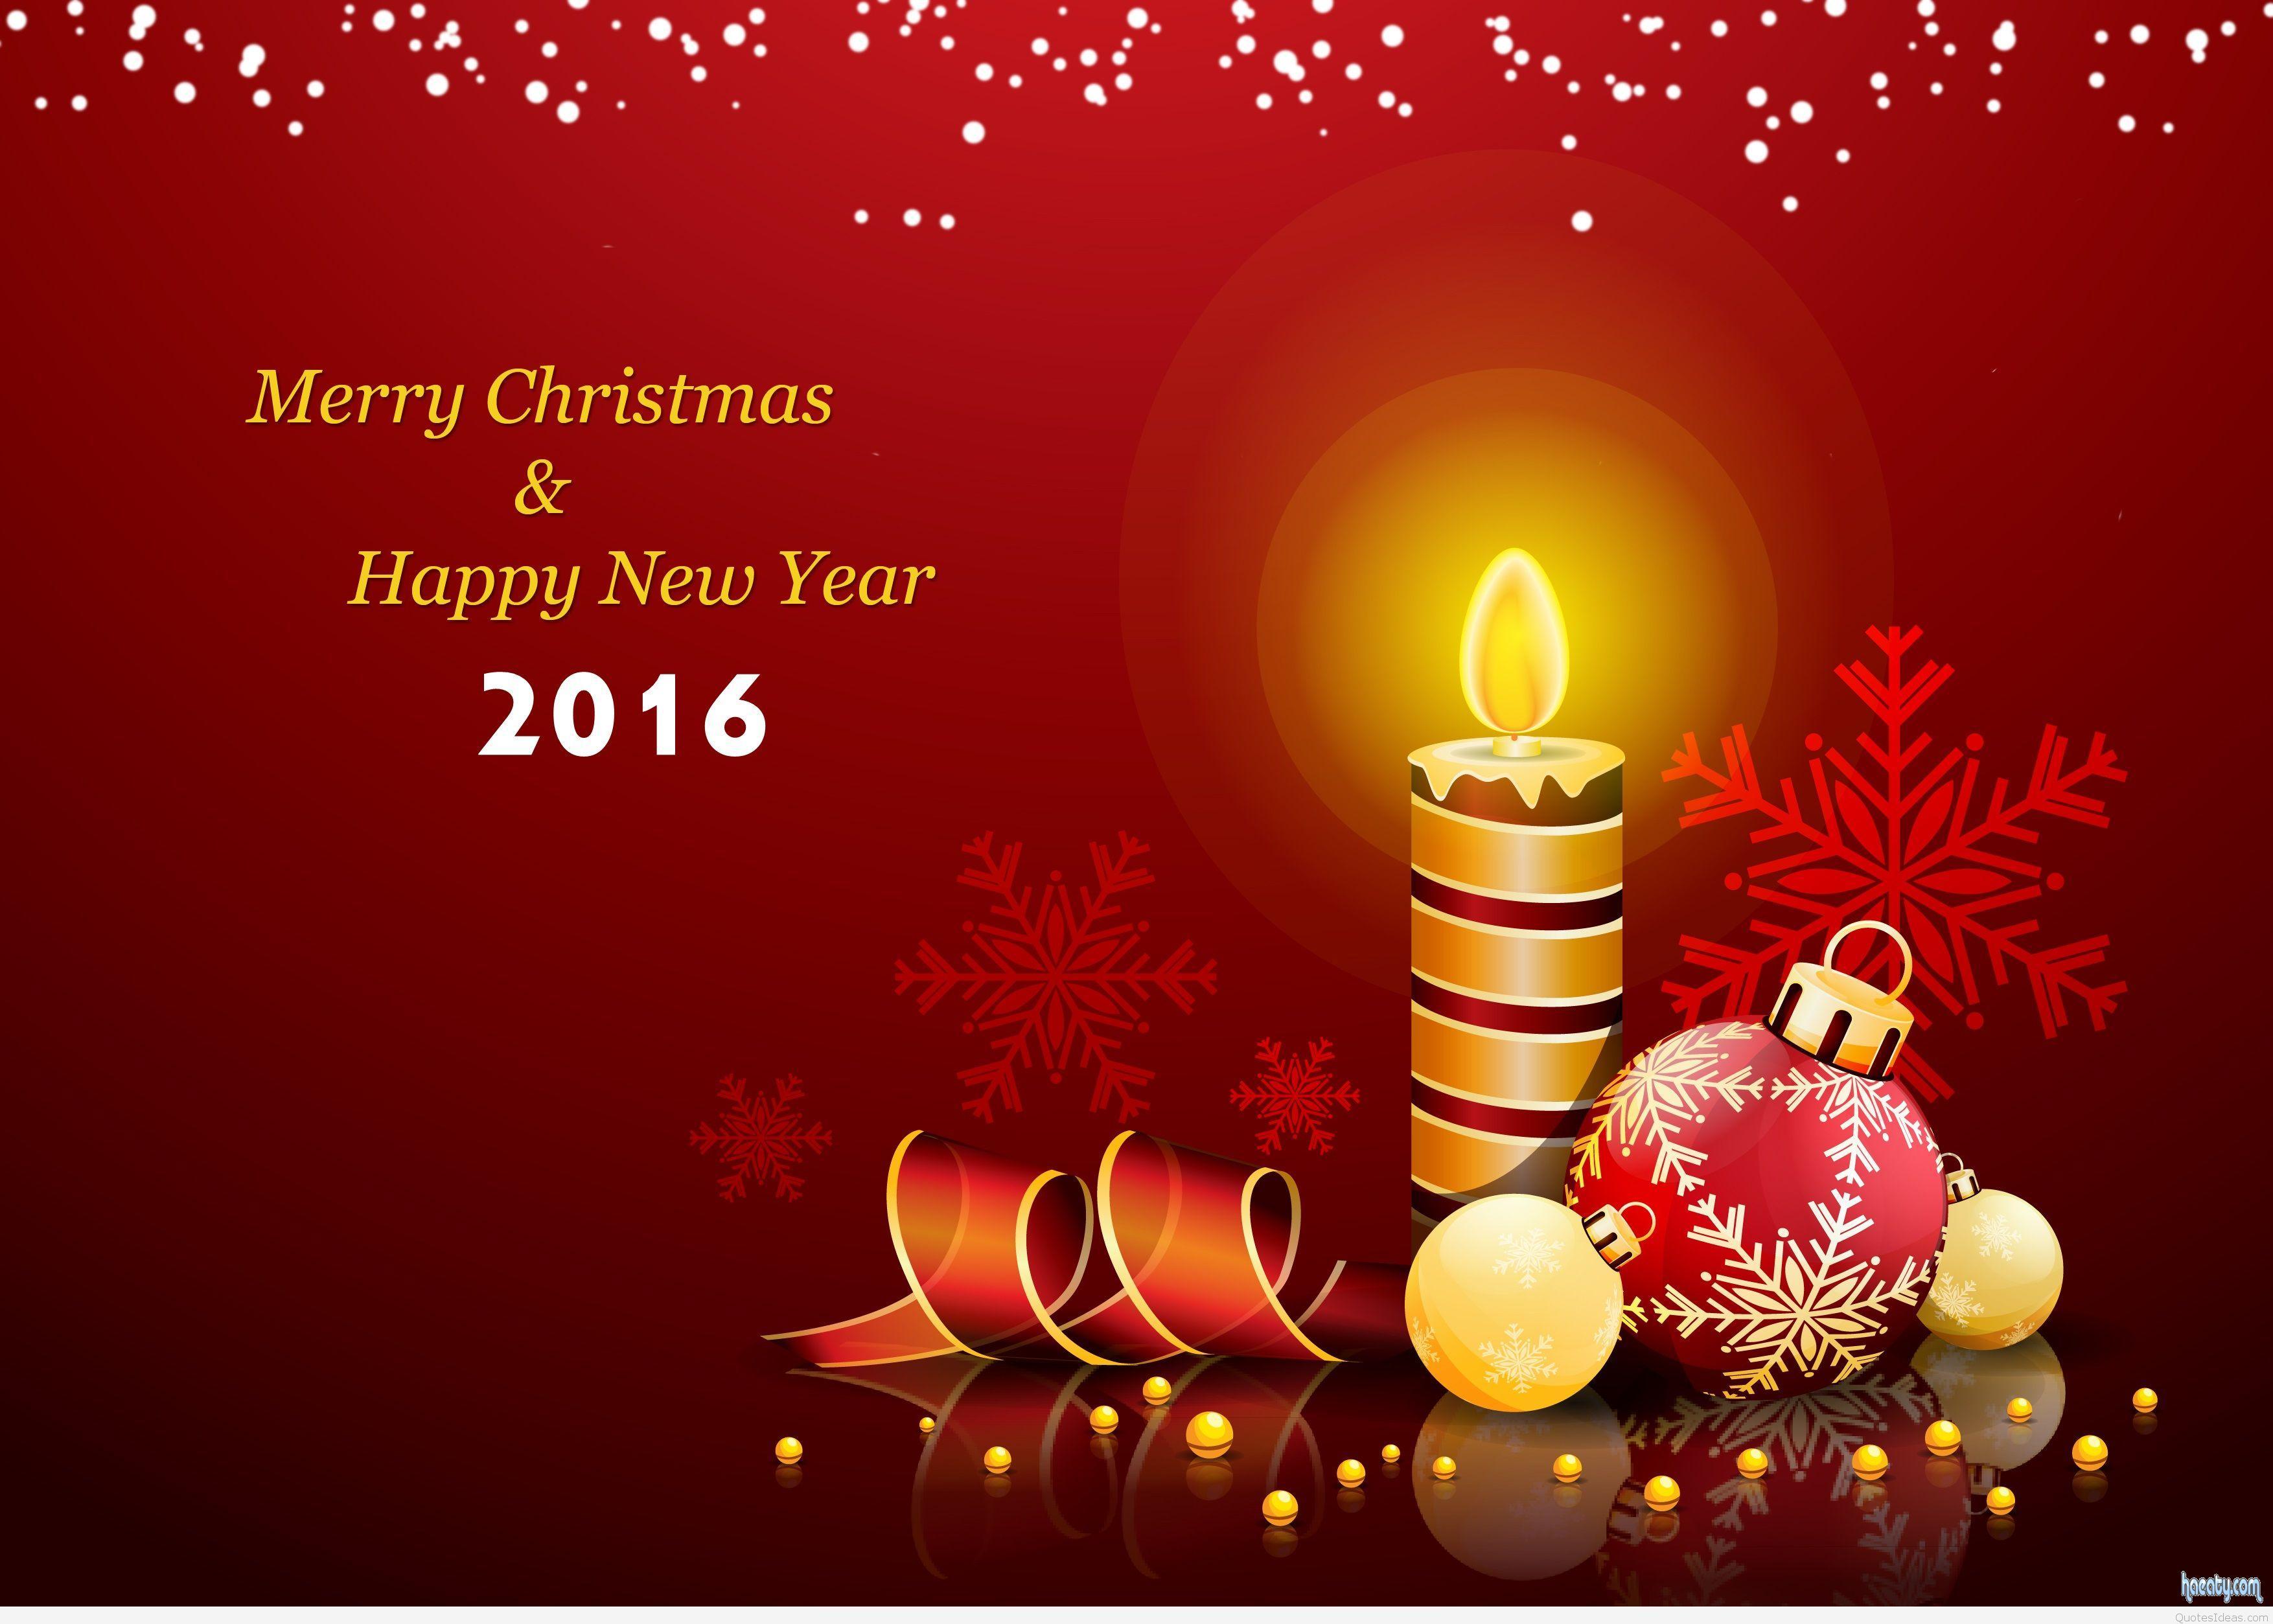 الكريسماس 2016-Merry-Christmas-and-Happy-new-year-2016 1450540839251.jpg